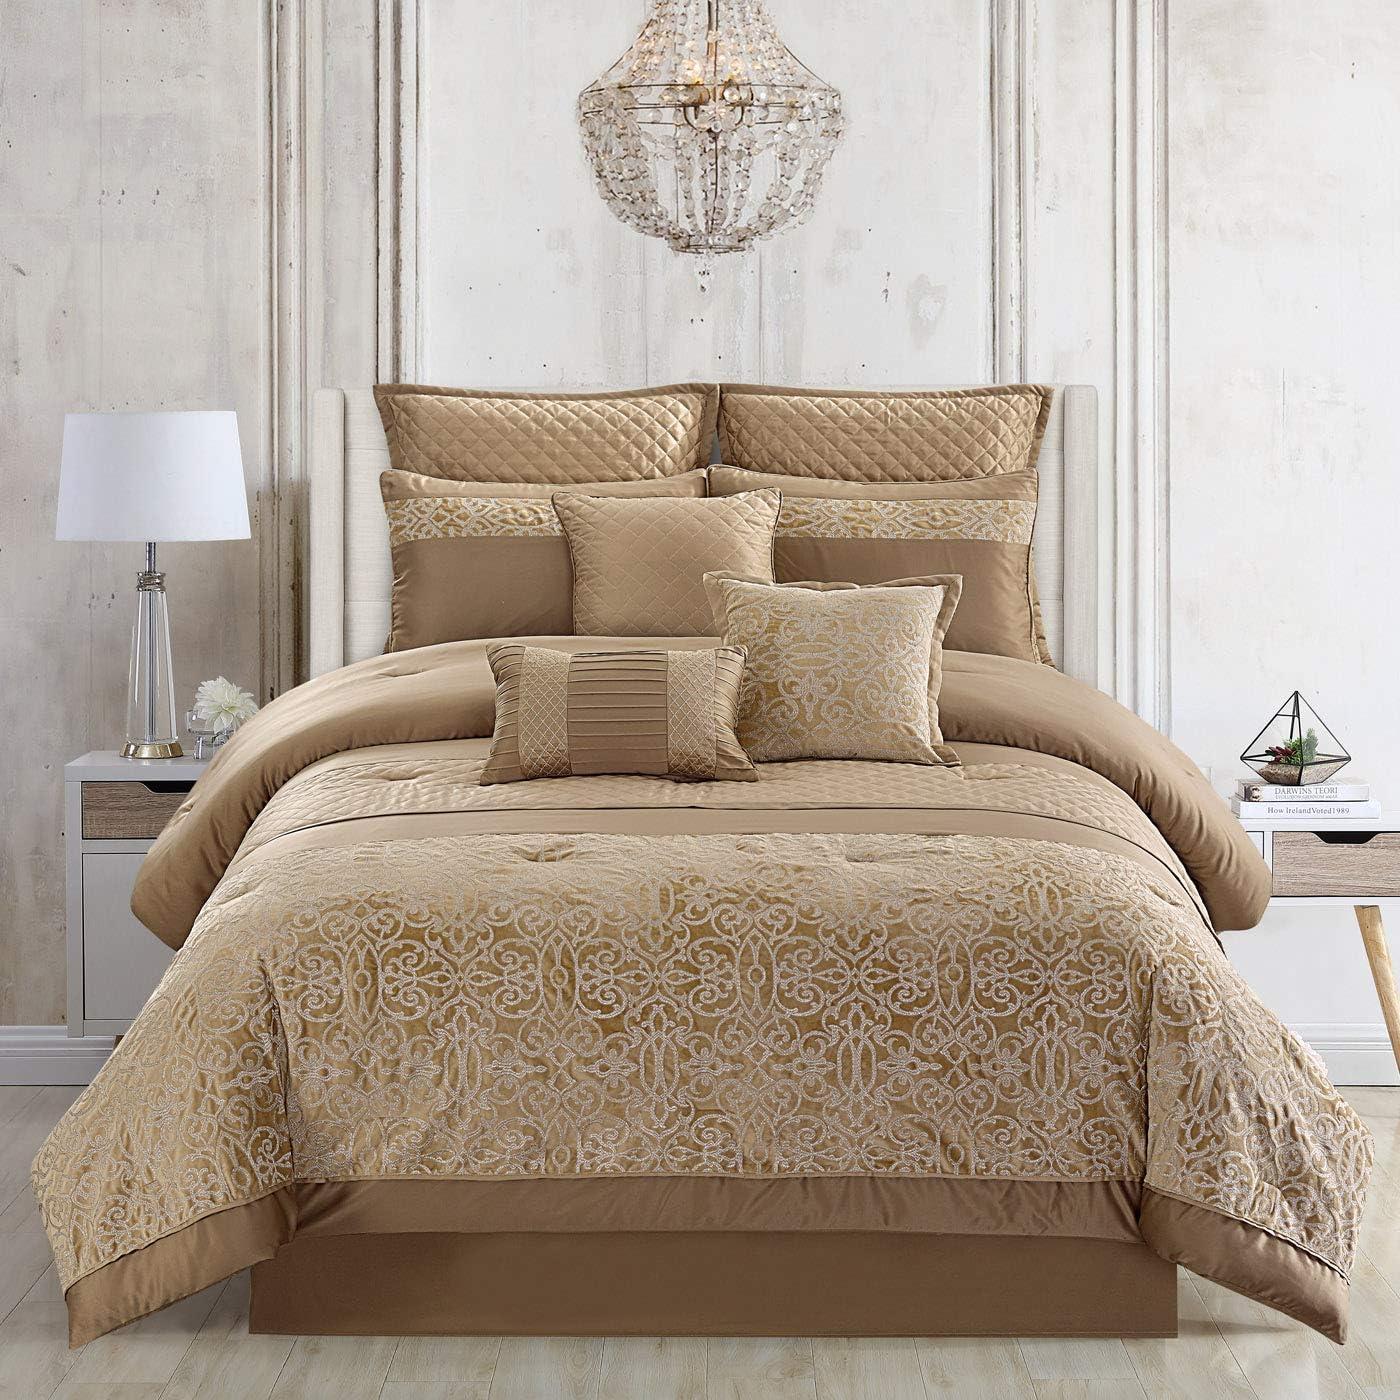 Amazon Com Riverbrook Home 8100 Polyester Comforter Set Queen 9 Piece Moraga Gold Home Kitchen